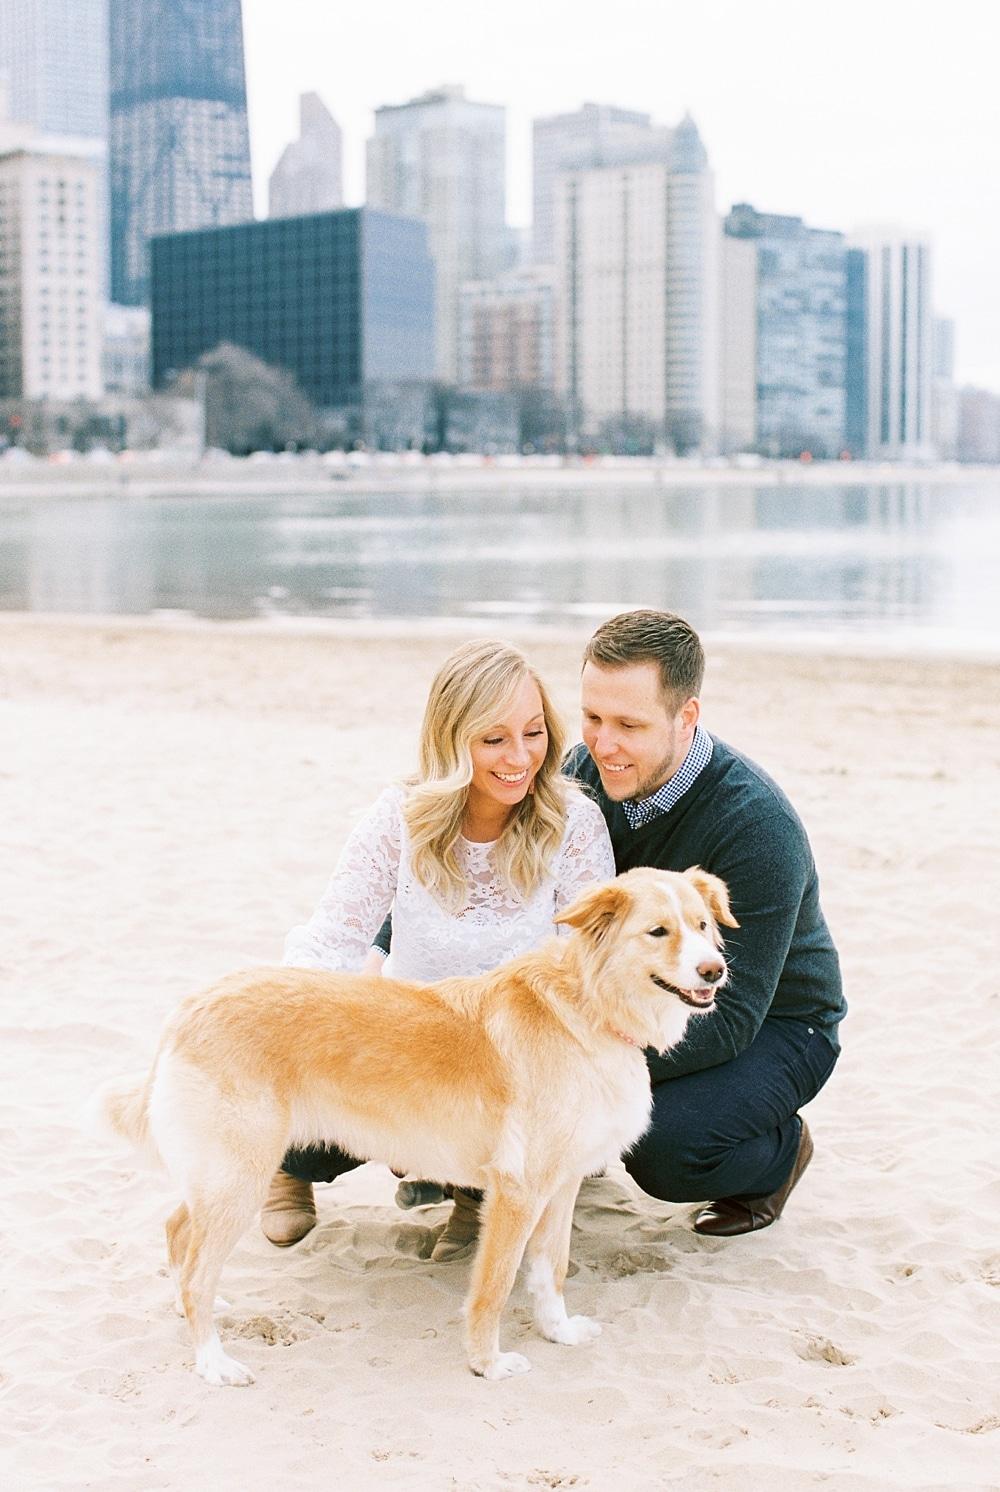 Kristin-La-Voie-Photography-Chicago-Wedding-Photographer-7